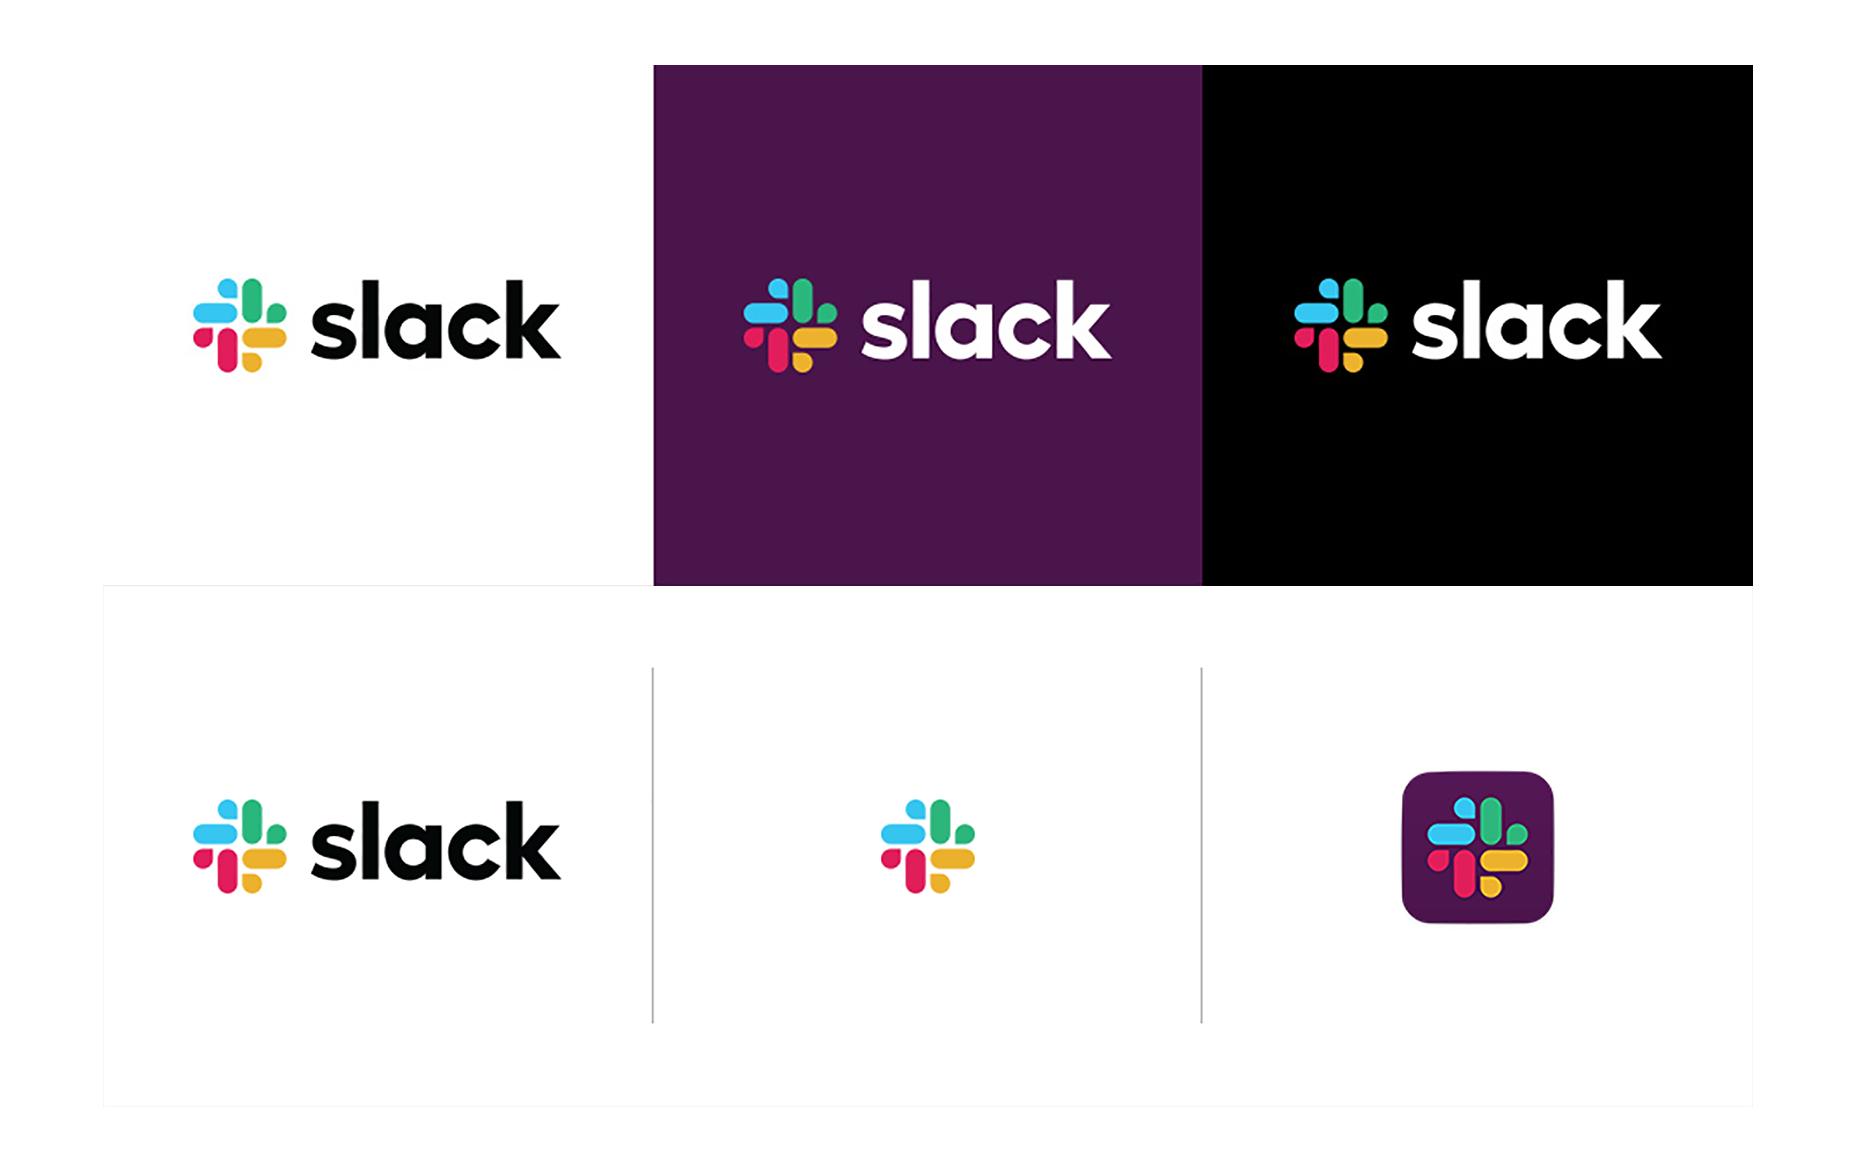 slack_refresh